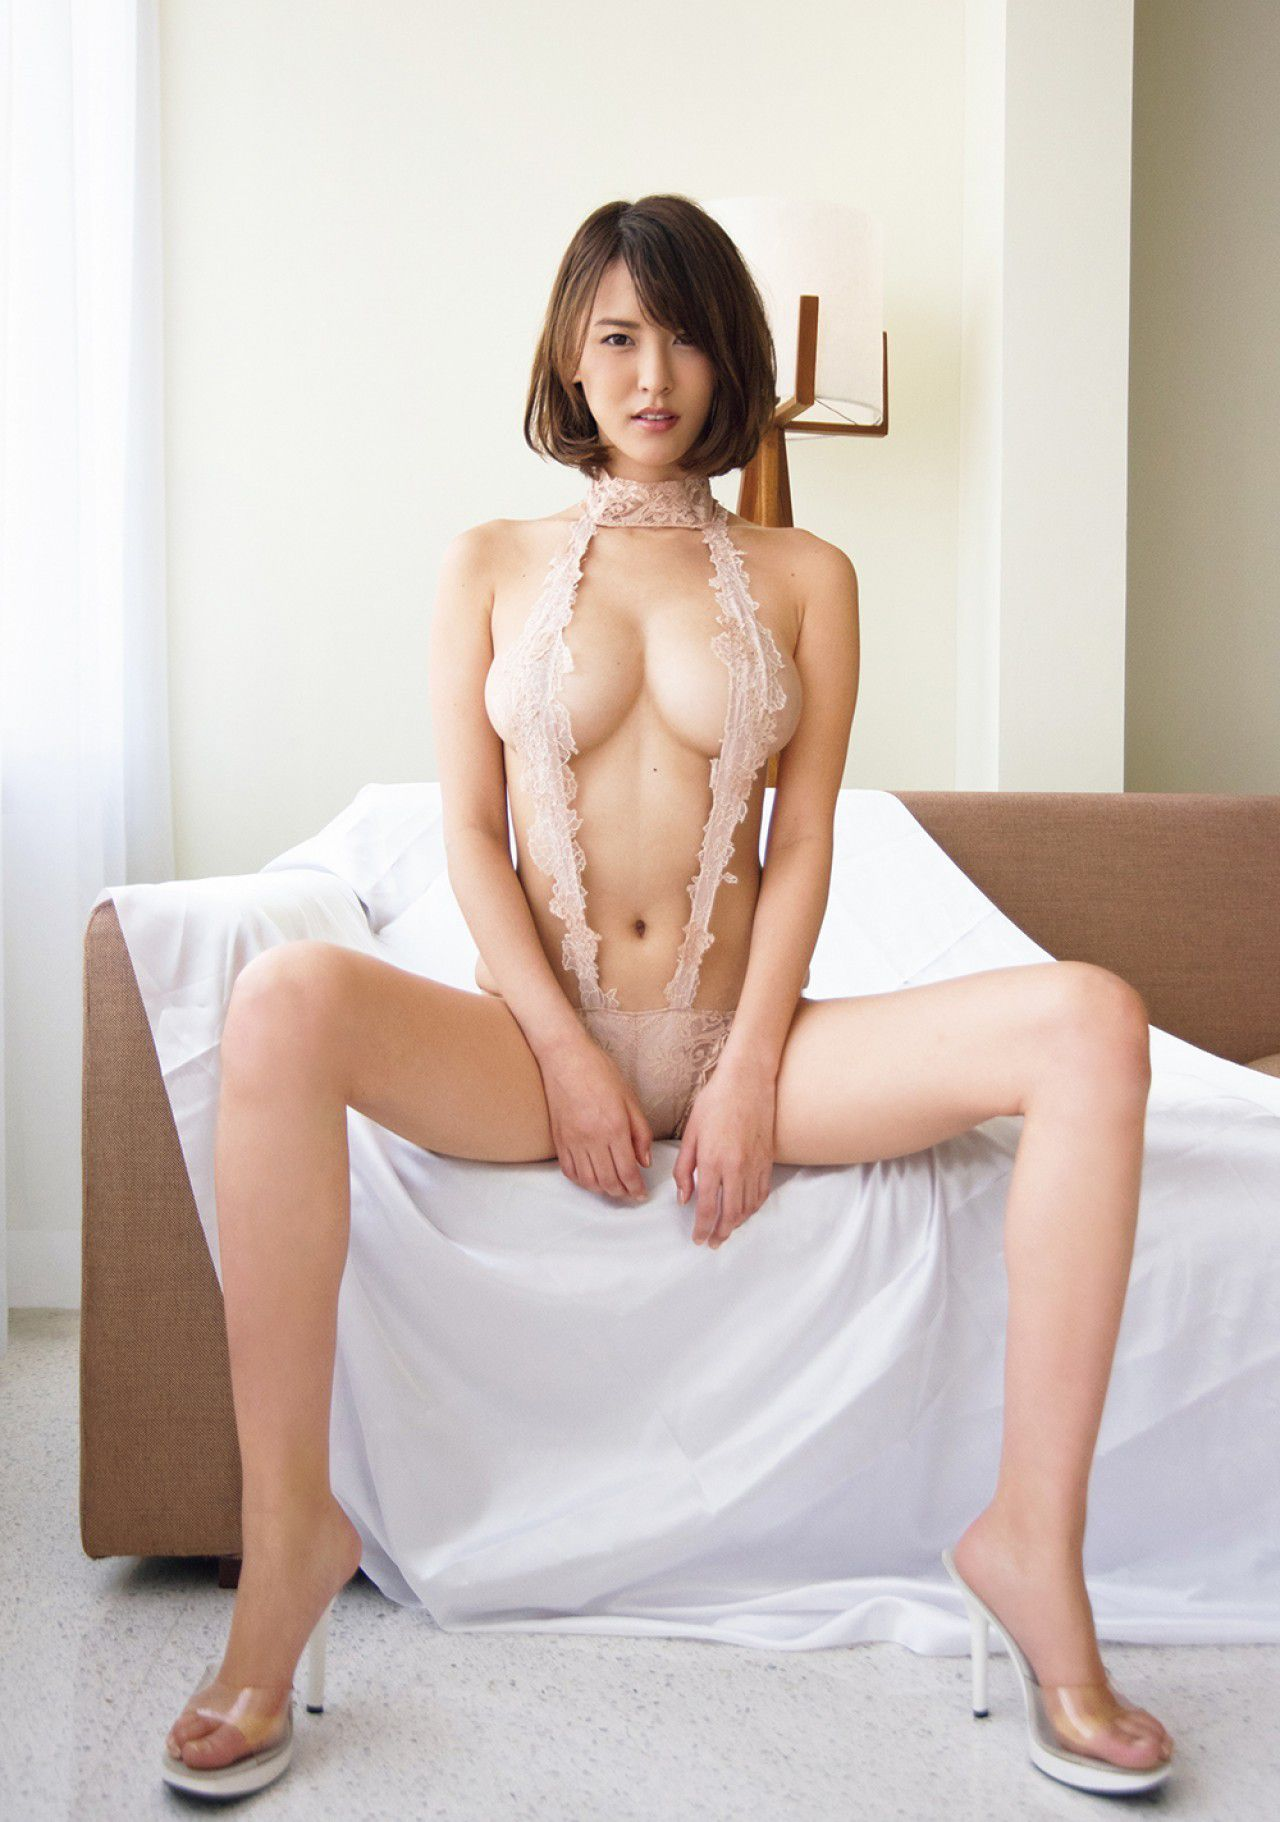 VOL.941 [FRIDAY]女神爆乳丰满少妇:奈月セナ超高清写真套图(10P)